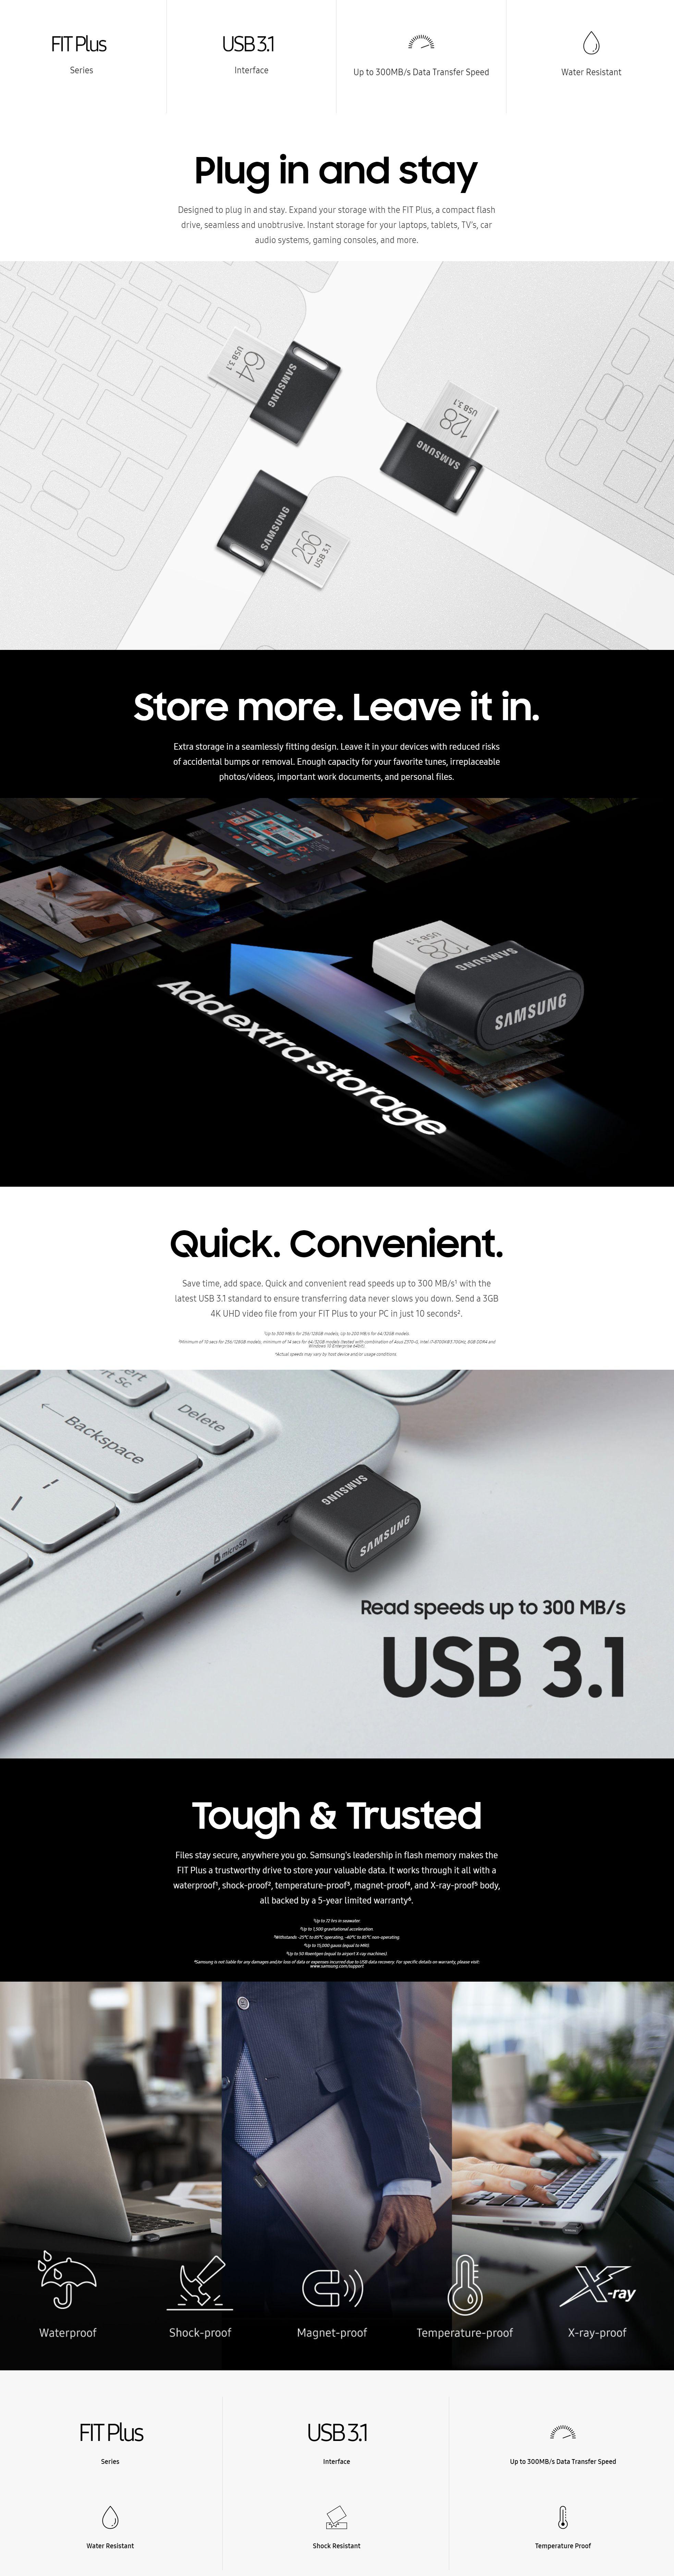 #1558 - 'USB 3_1 Flash Drive FIT Plus 128GB Memory & Storage - MUF-128AB_AM I Samsung US' - www_samsung_com.jpg